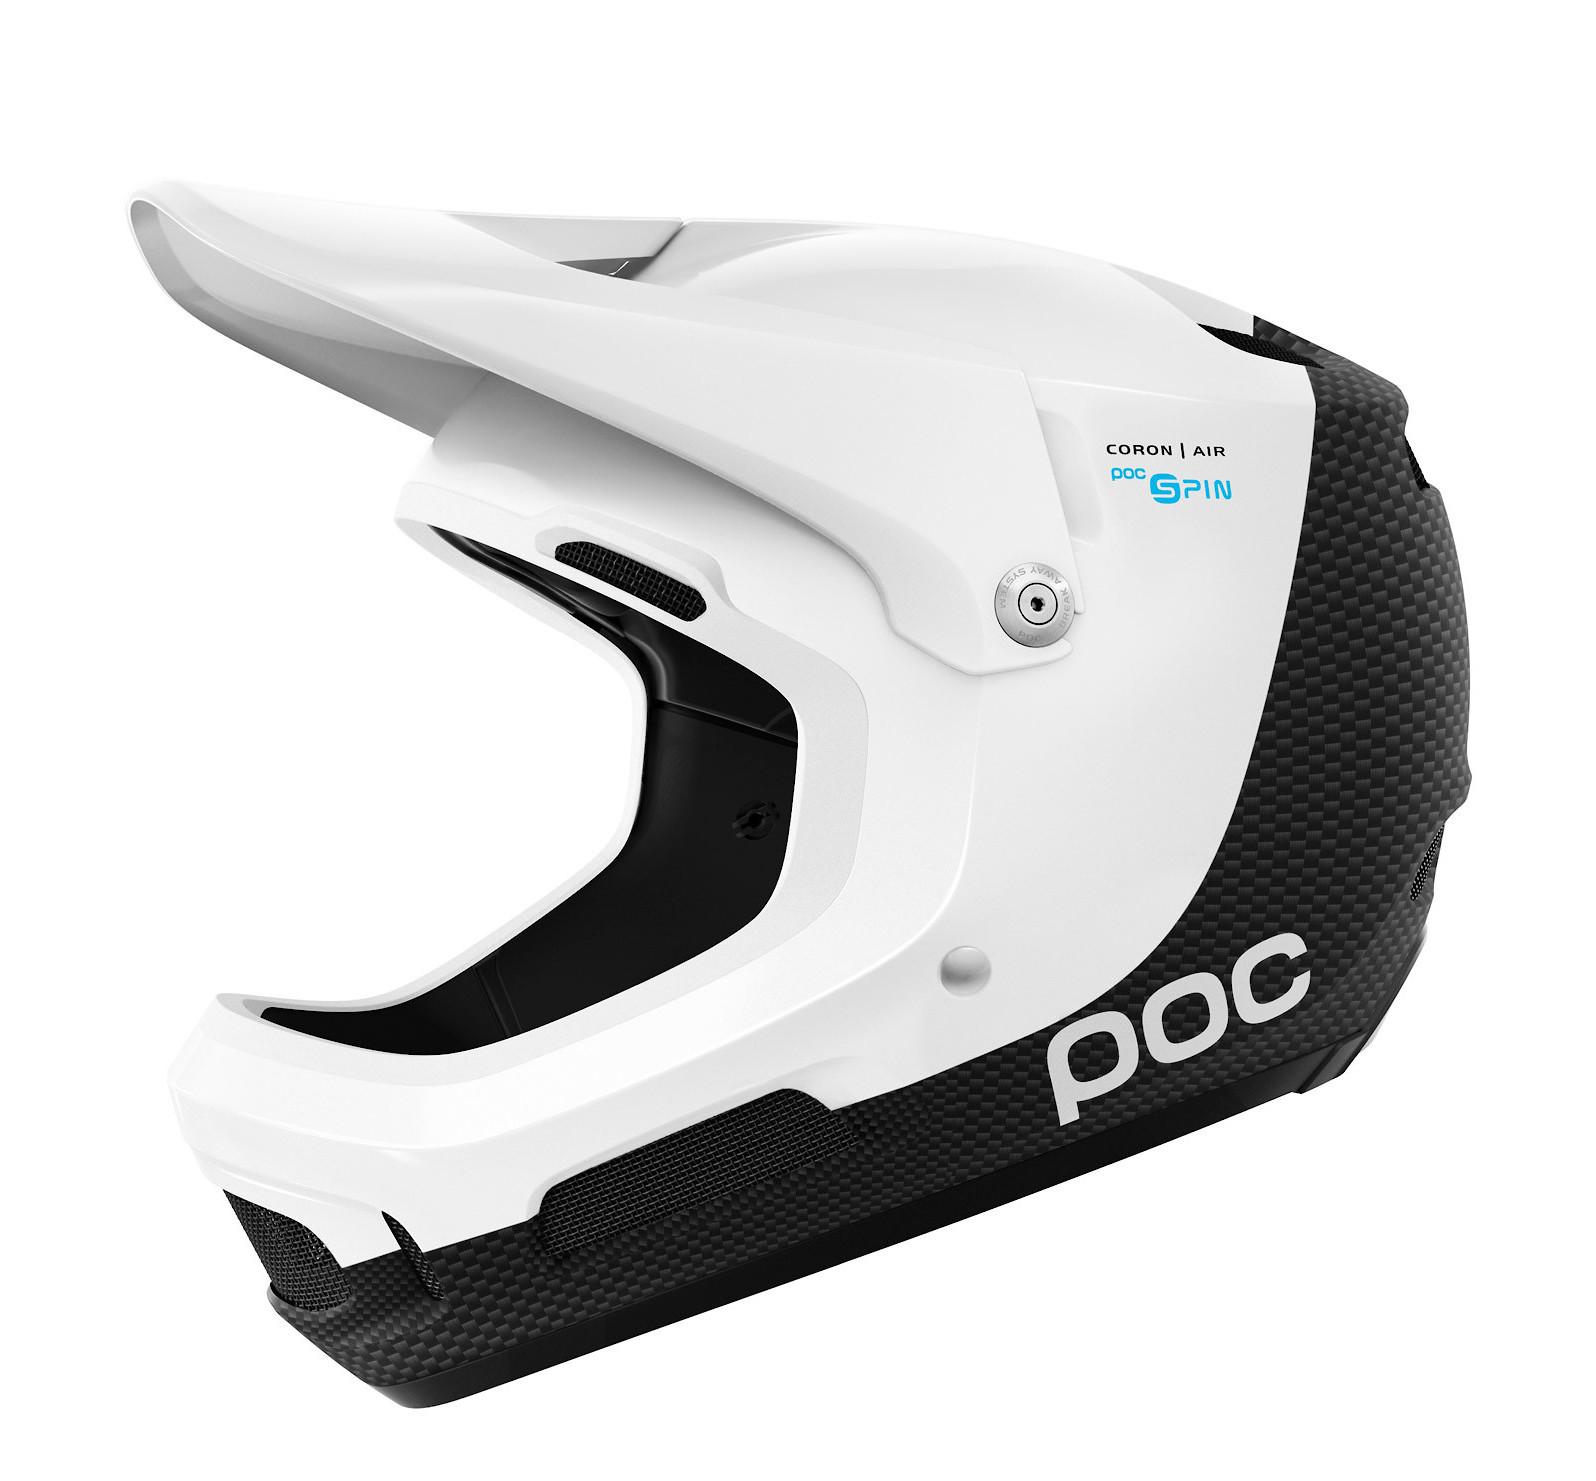 POC Coron Air Carbon SPIN Full Face Helmet